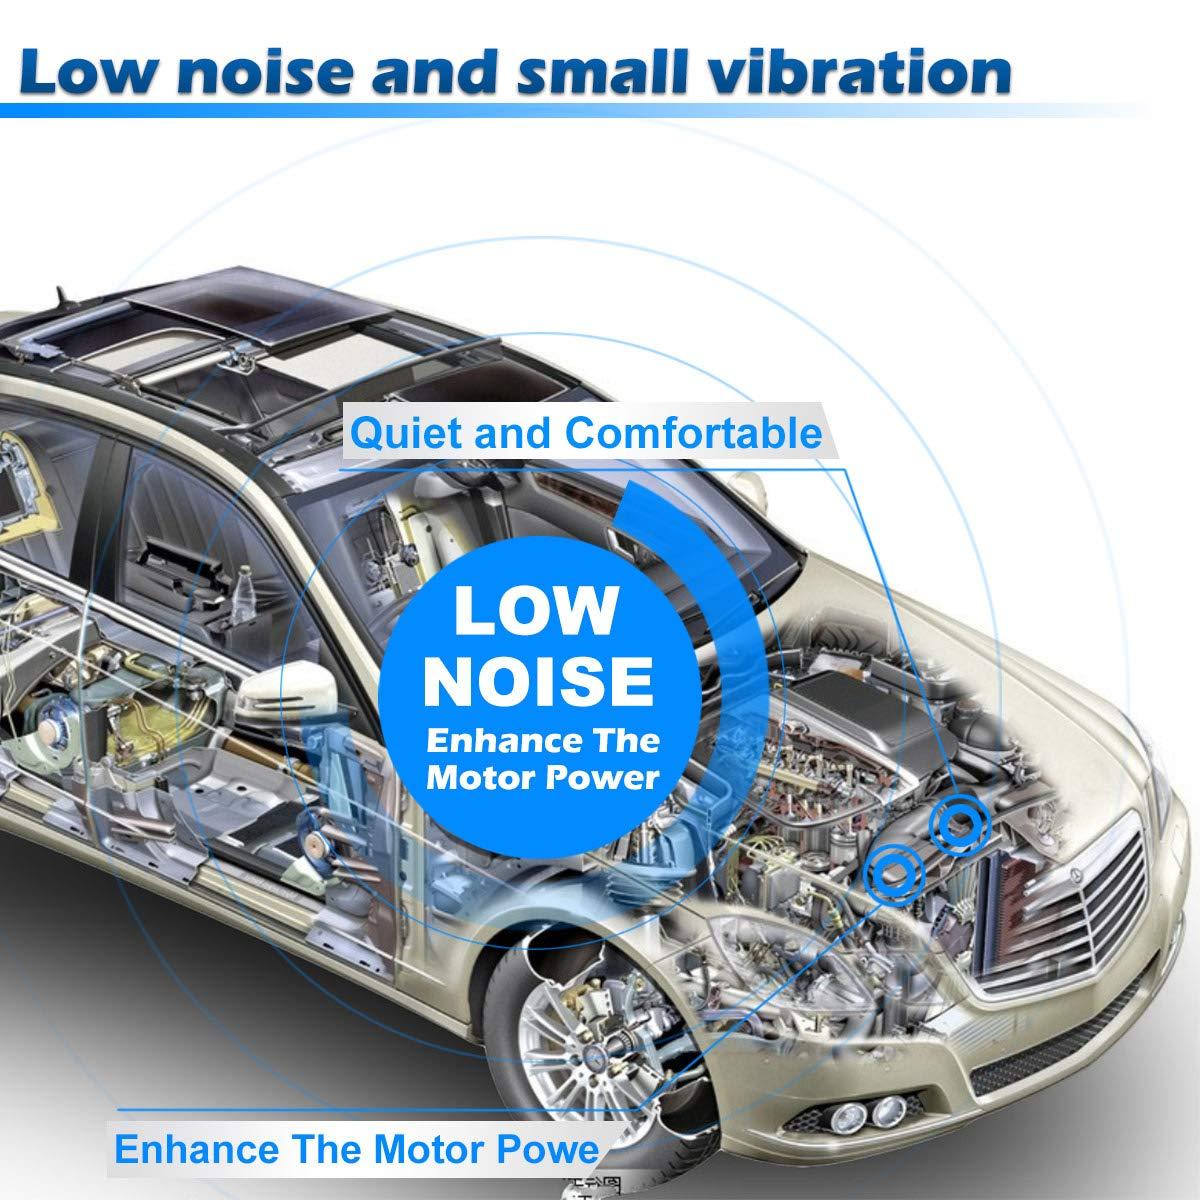 AC Compressor and A//C Clutch AUTEX CO 10663AC 38810PNB006 638951 7511495 20-11242 Compressor Replacement for 2002 2003 2004 2005 2006 Honda CR-V 2.4L